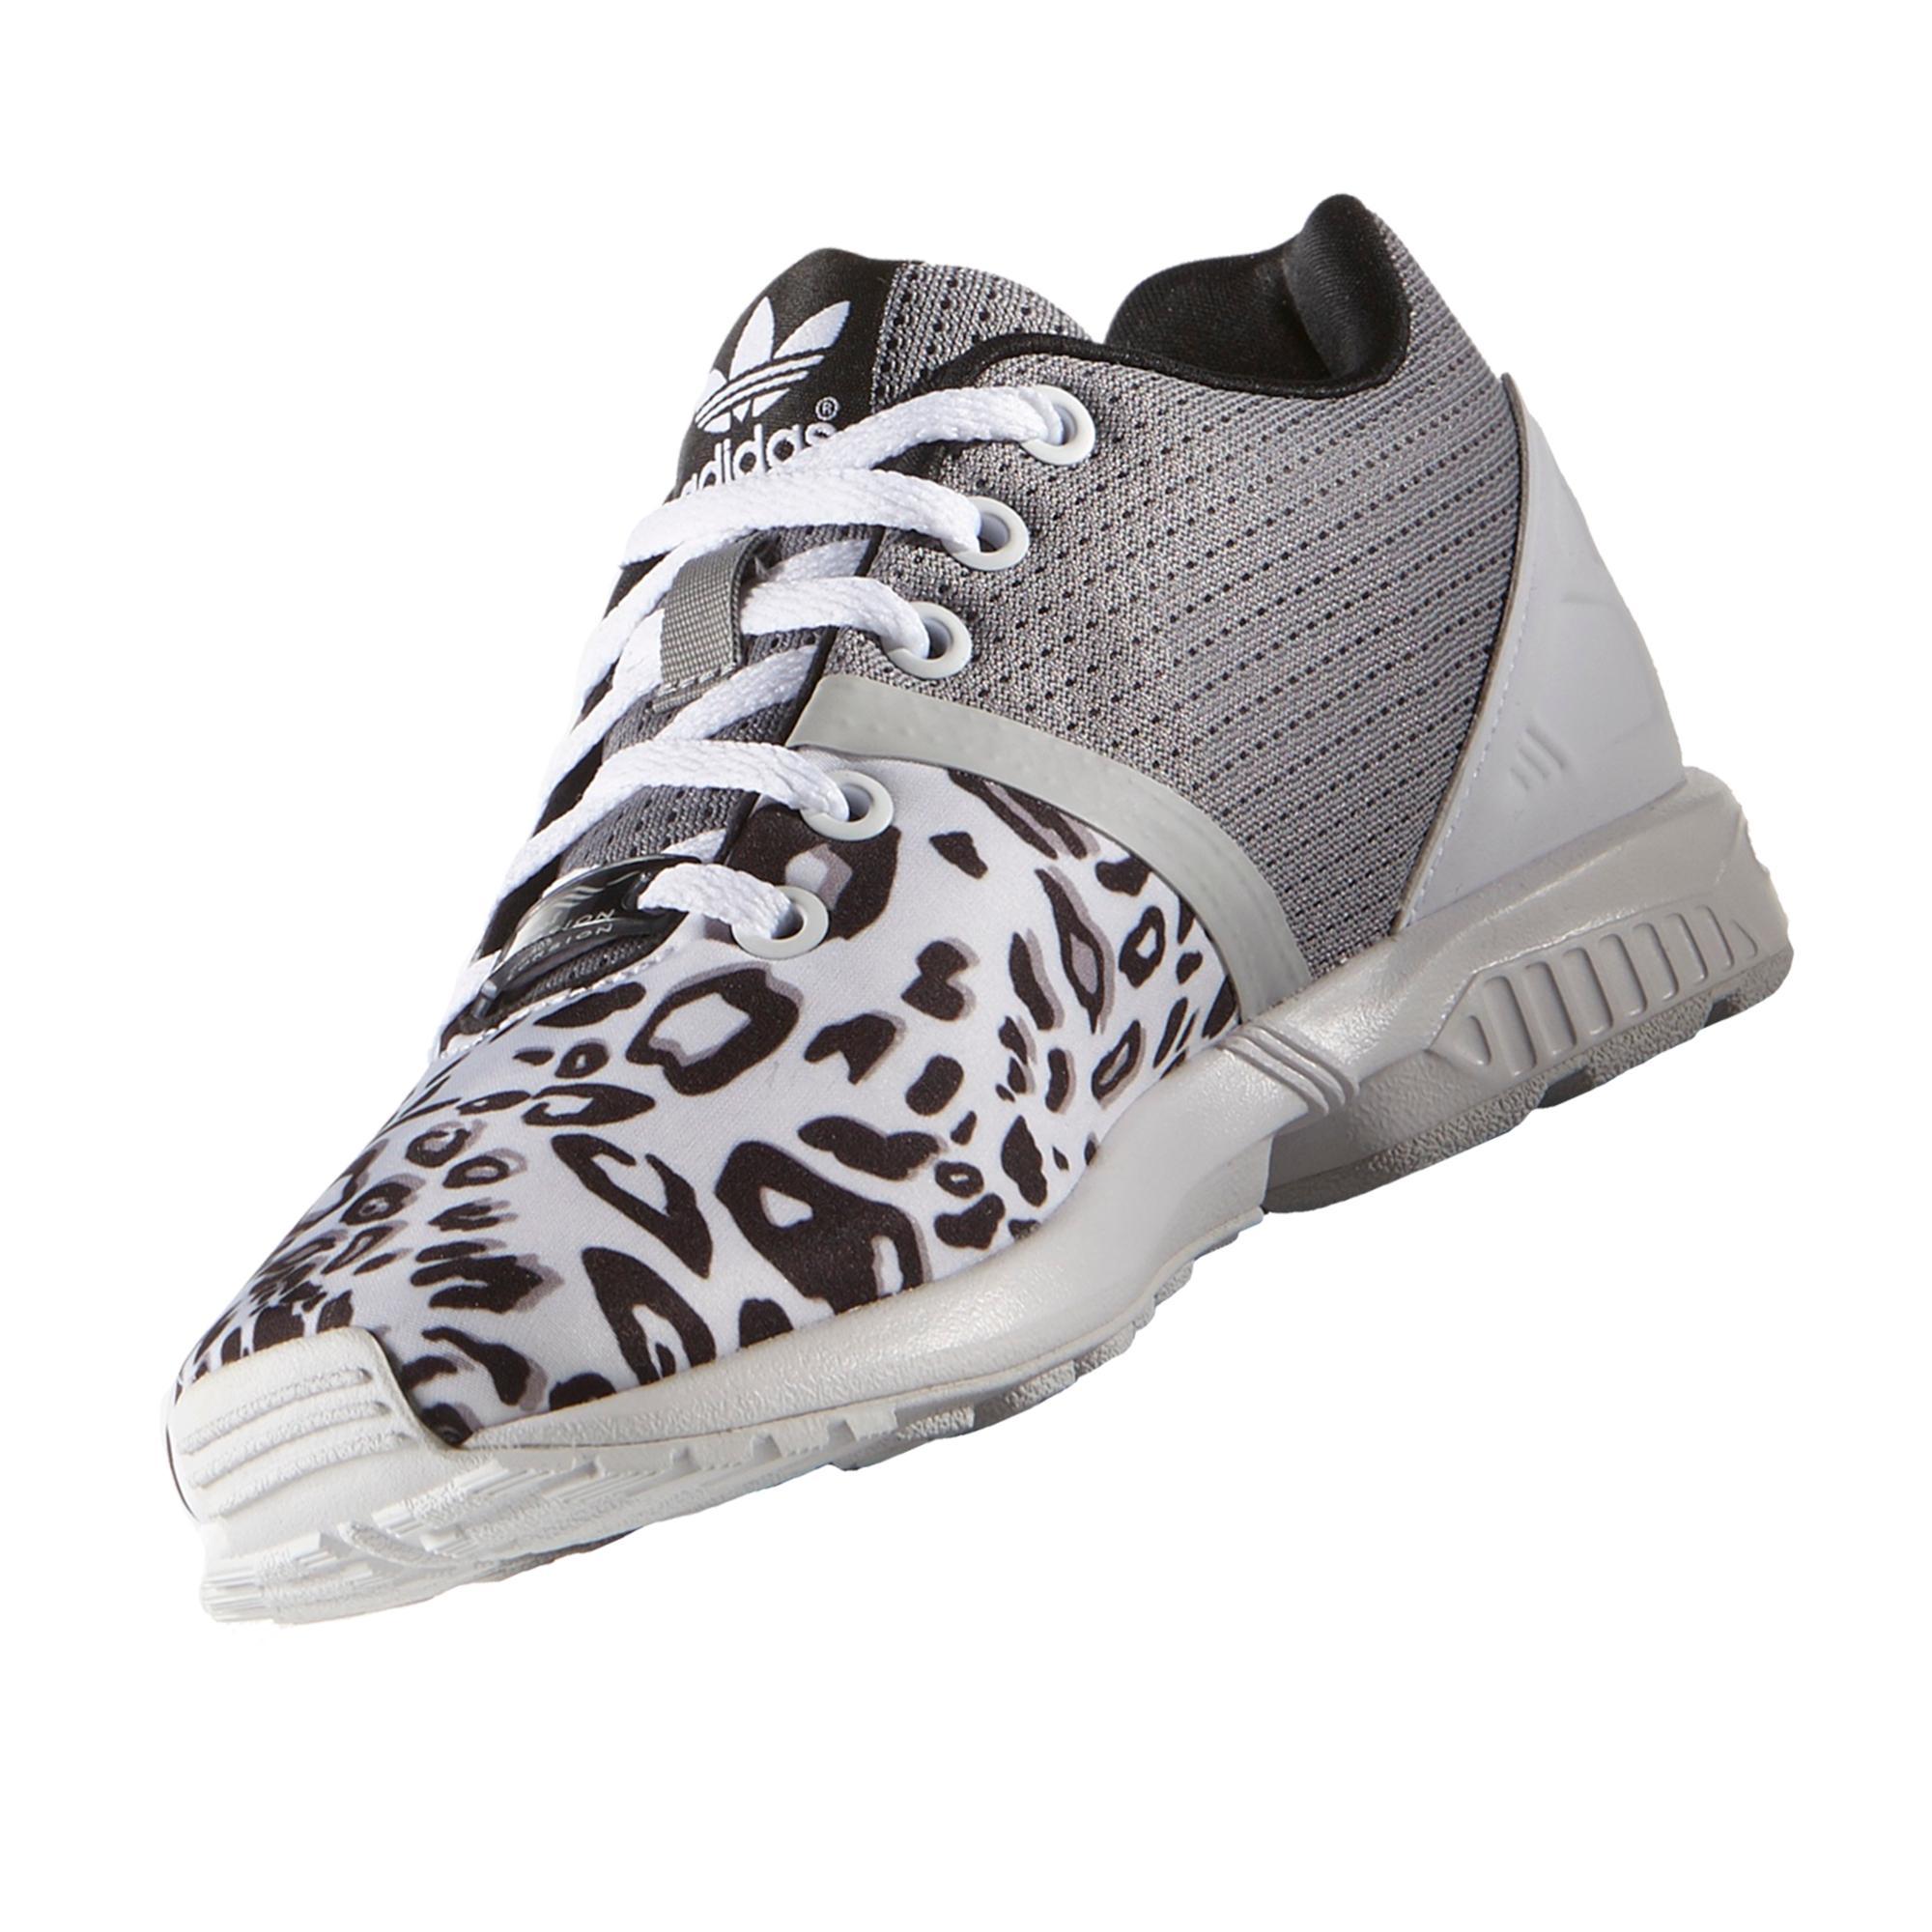 newest 9e707 64571 adidas Zx Flux Split Leopard (Gs) Spor Ayakkabı